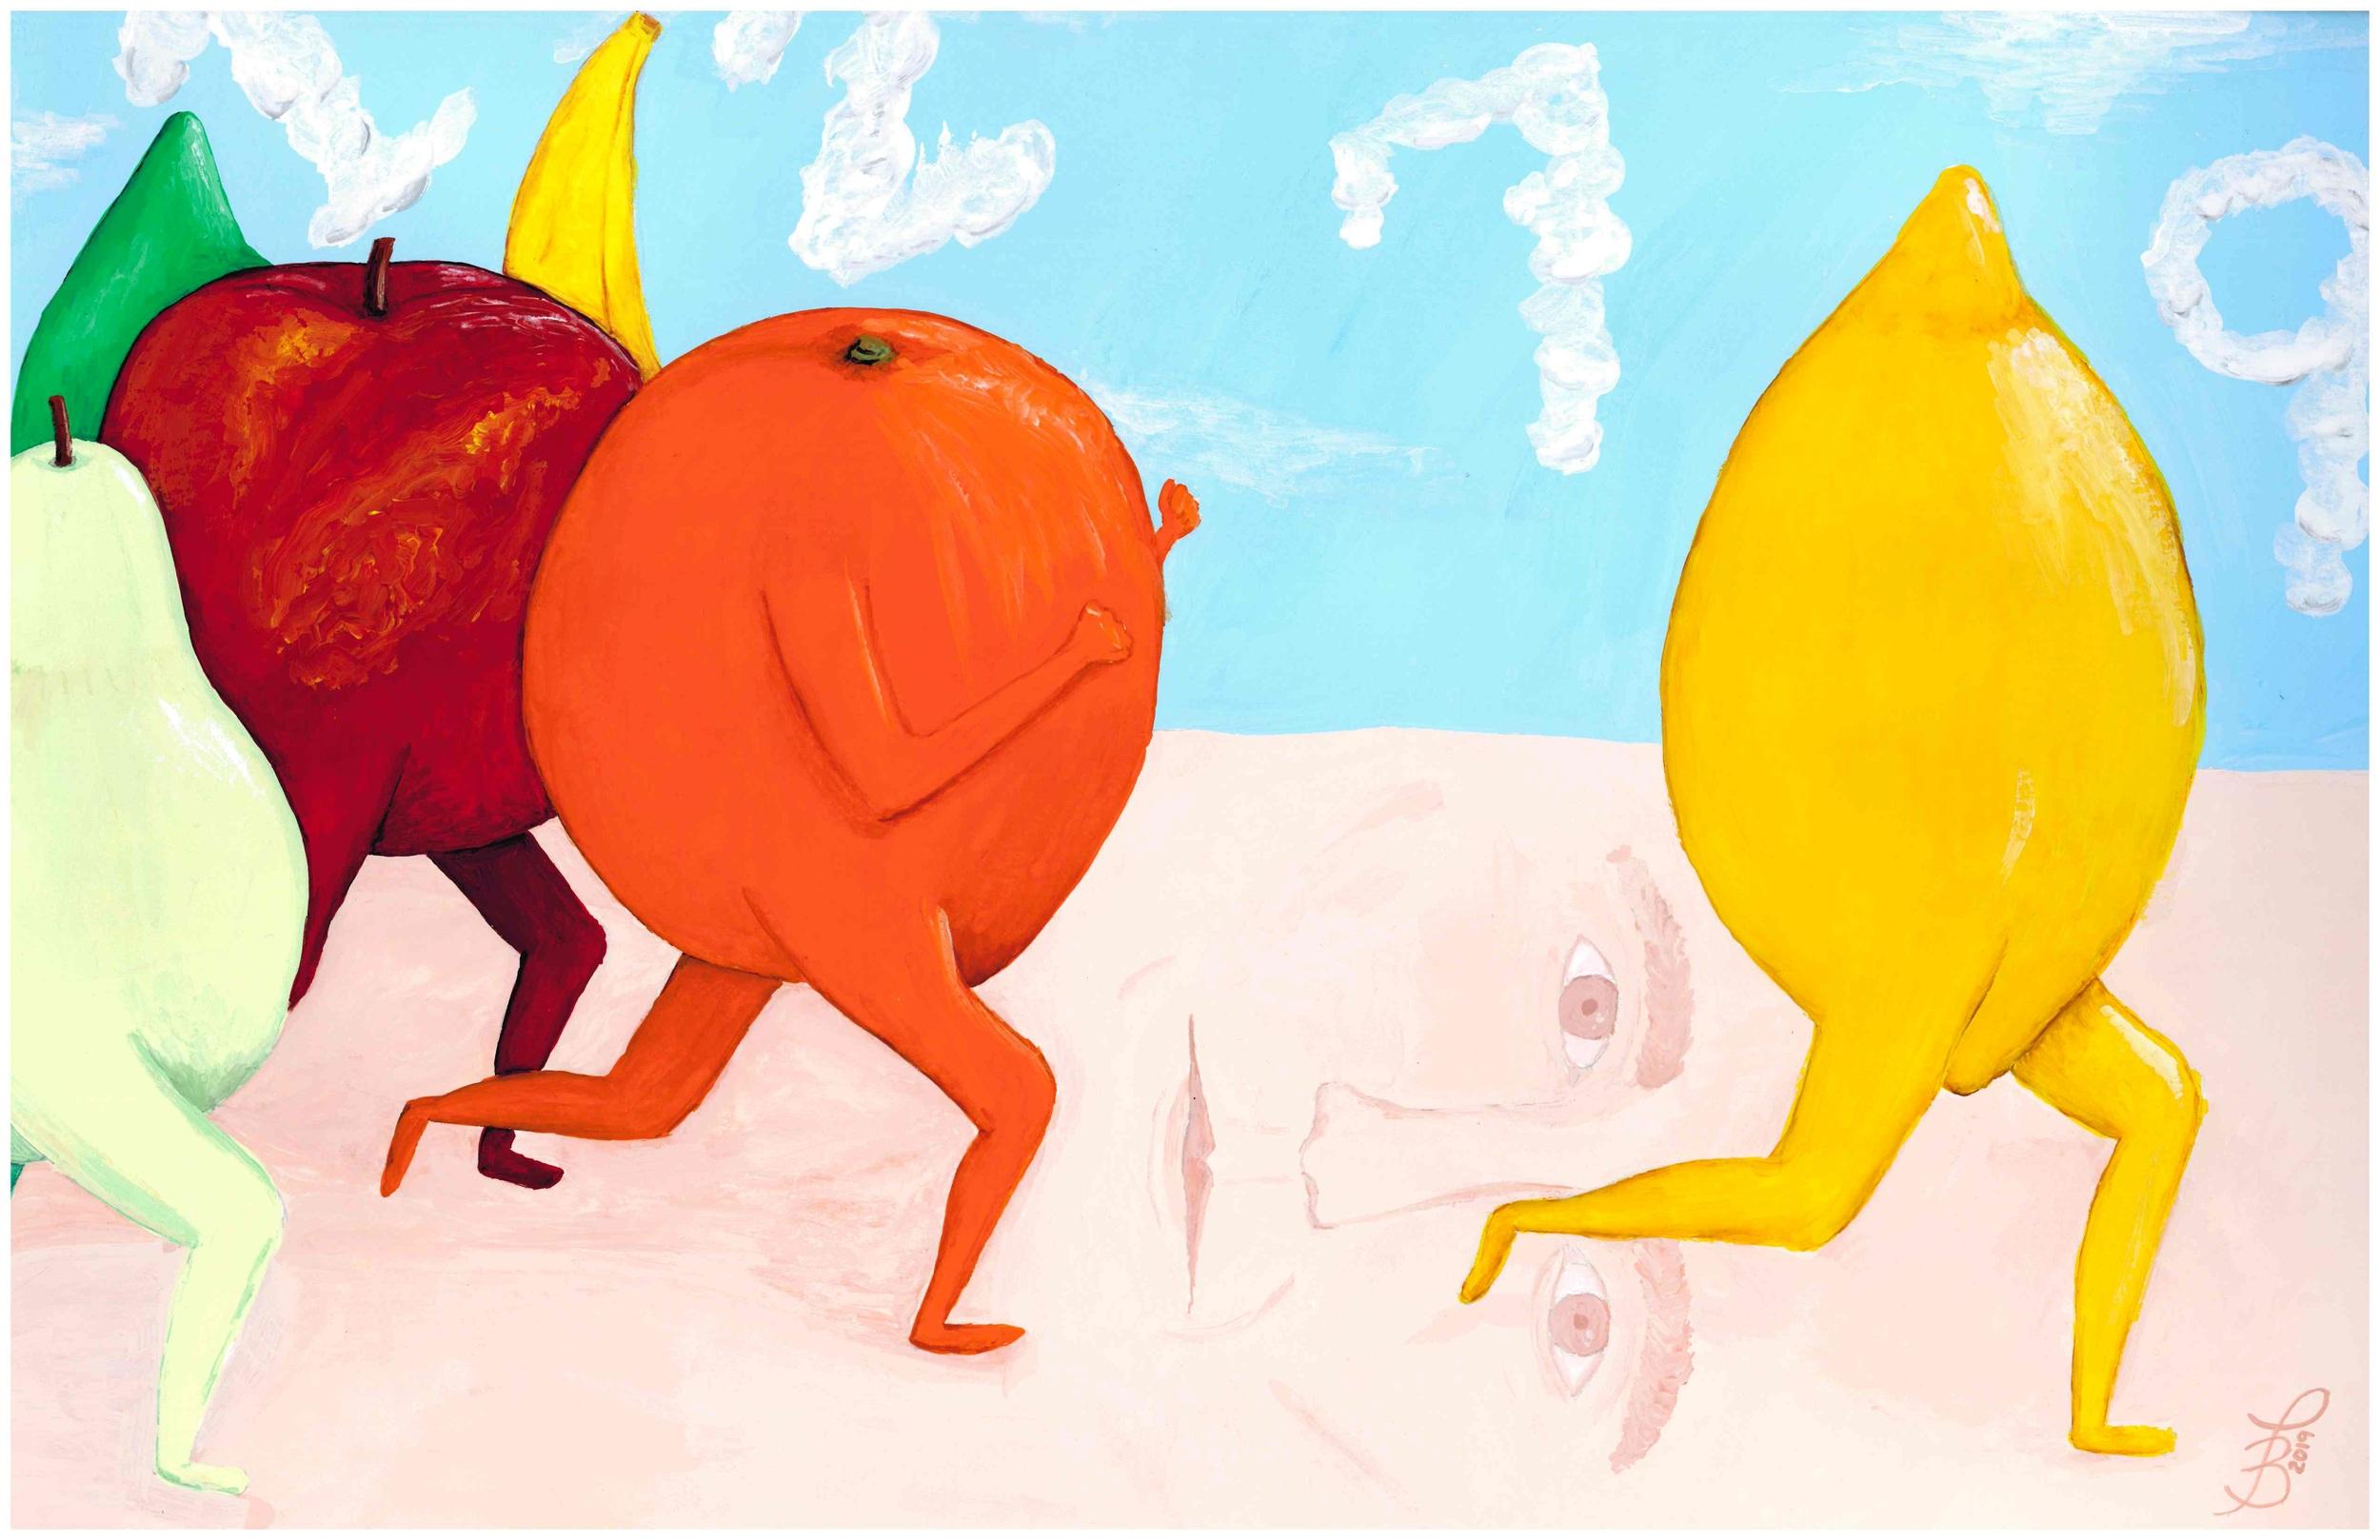 The Origin Story (of Gerald the Lemon) Poster II | 2019